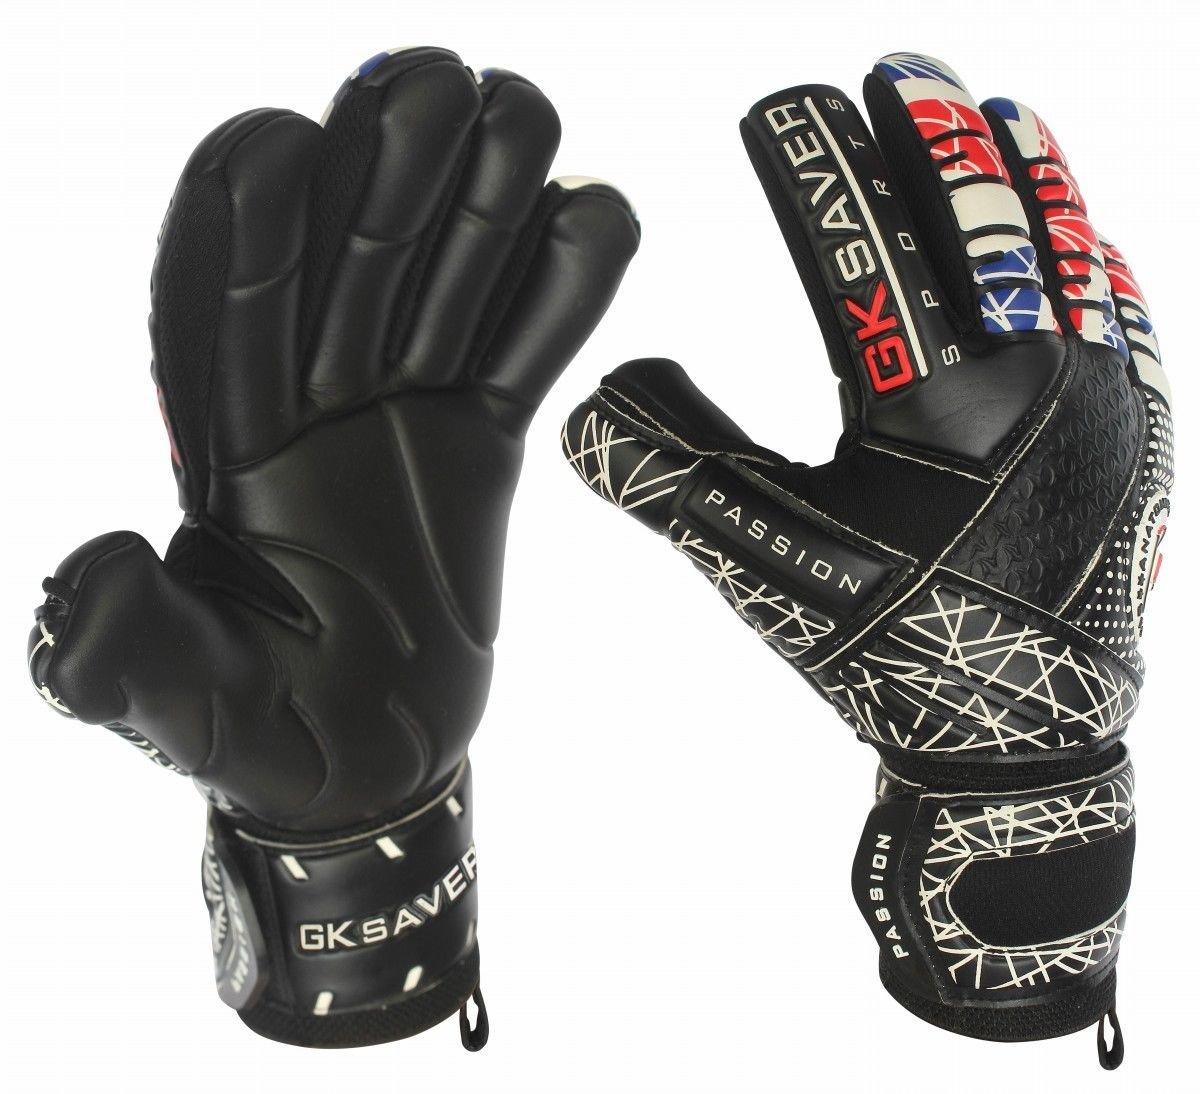 Fußball-Torwart-Handschuhe von GK Saver, Modell Passion Unity Negative Cut, UK-Flagge, Profi-Handschuh, personalisierbar